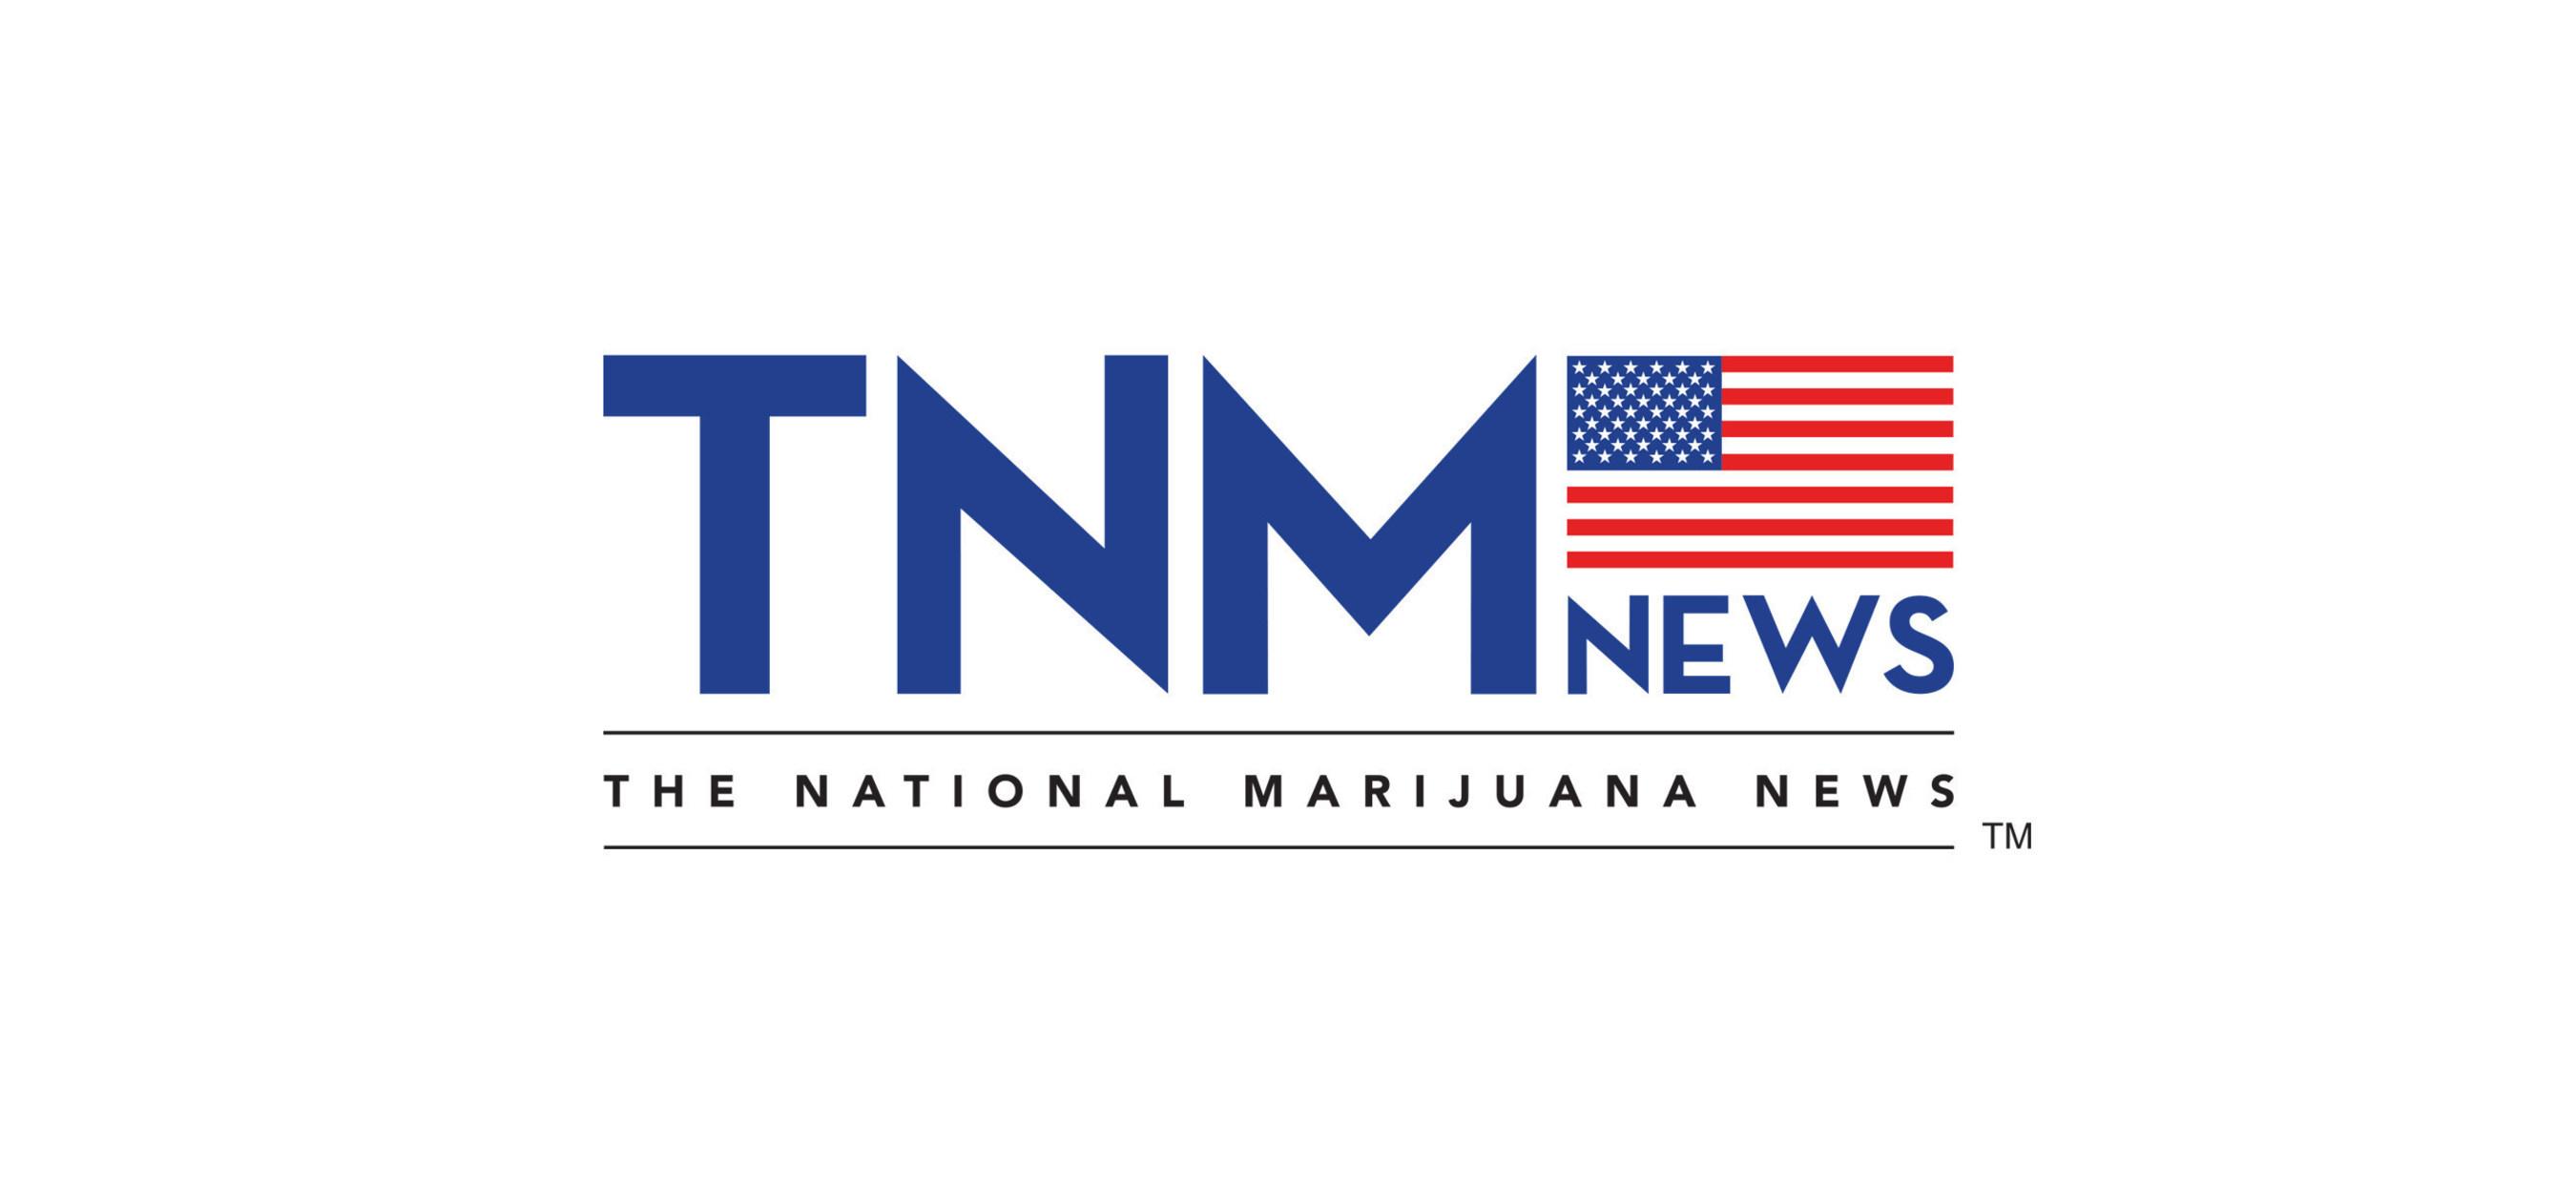 The National Marijuana News